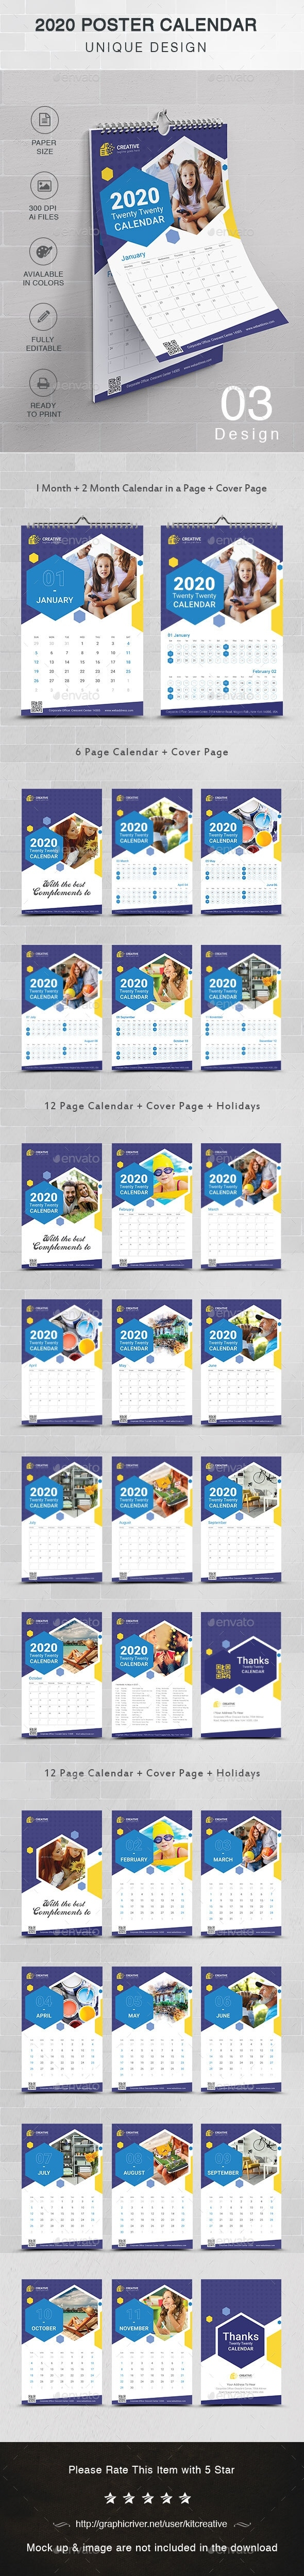 Calendar Poster Graphics, Designs & Templates From Graphicriver Calendar Template Graphic Design